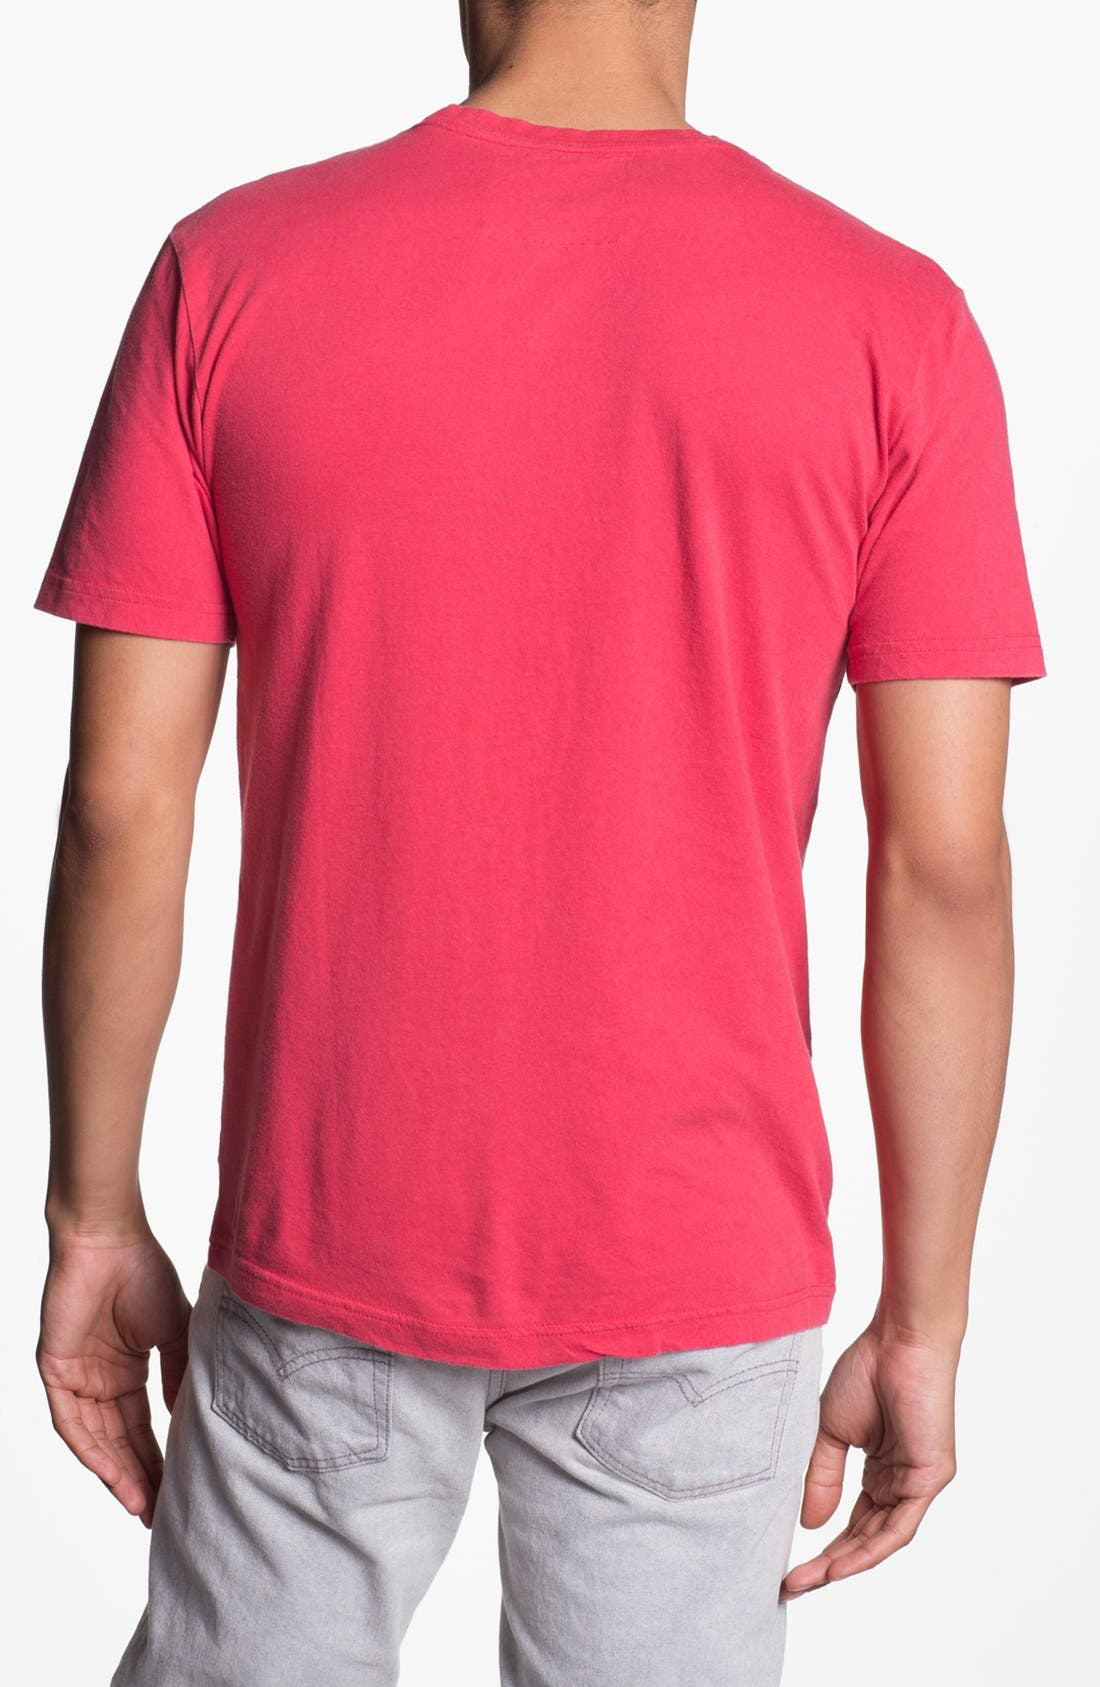 Alternate Image 2  - Red Jacket 'Hurricanes - Brass Tack' T-Shirt